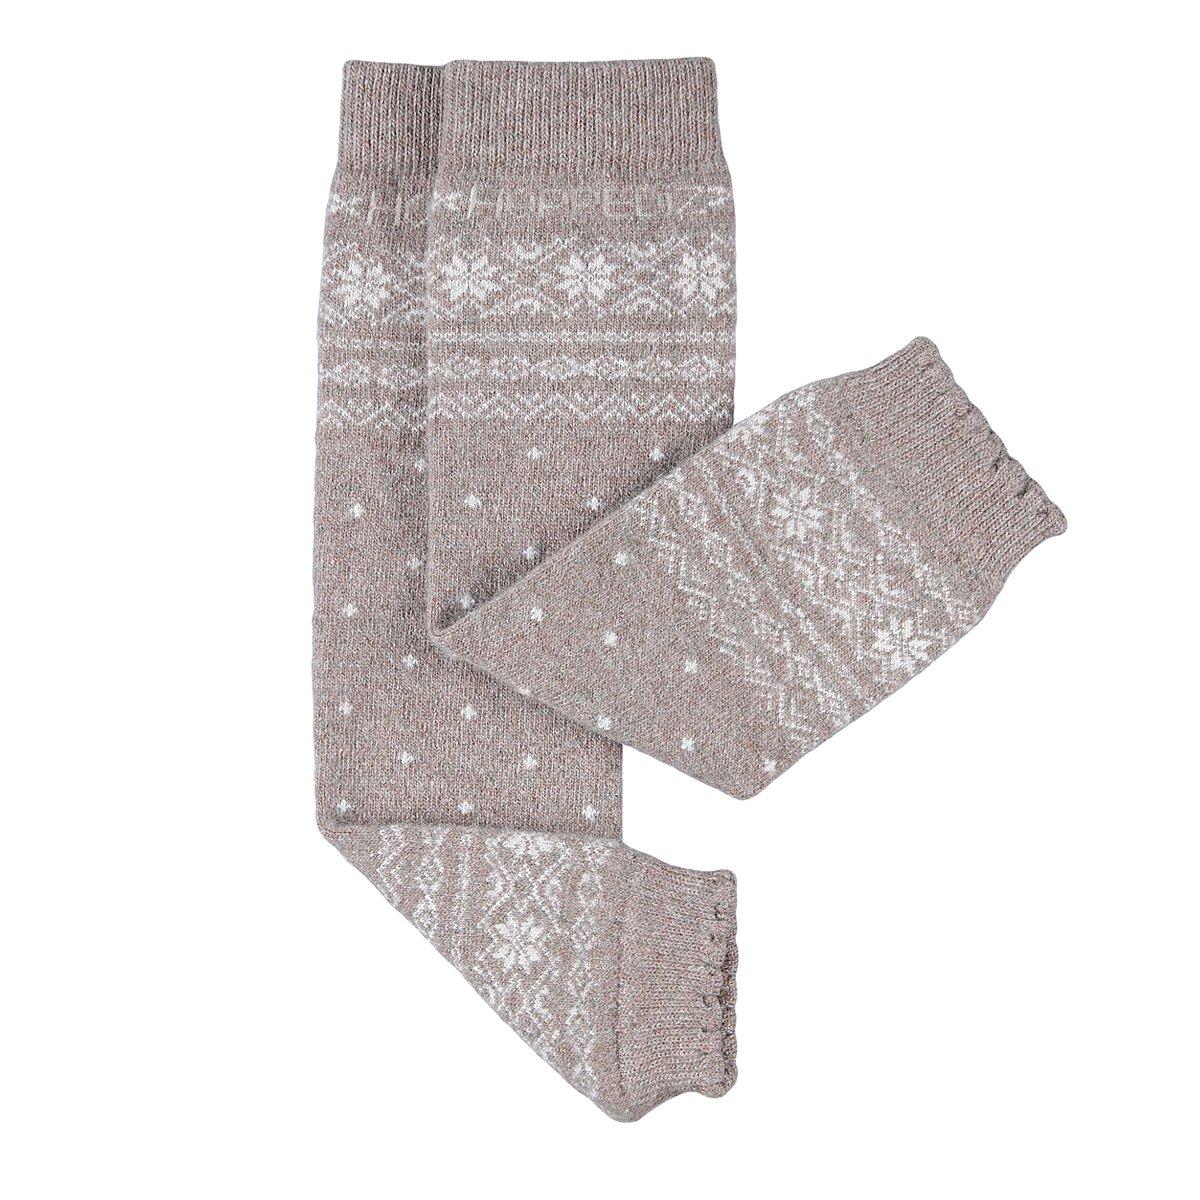 Hoppediz cashmere/lana merino Baby Leg Warmers (norvegese sabbia) HOPPEDIZ GmbH & Co. KG Stn-nat